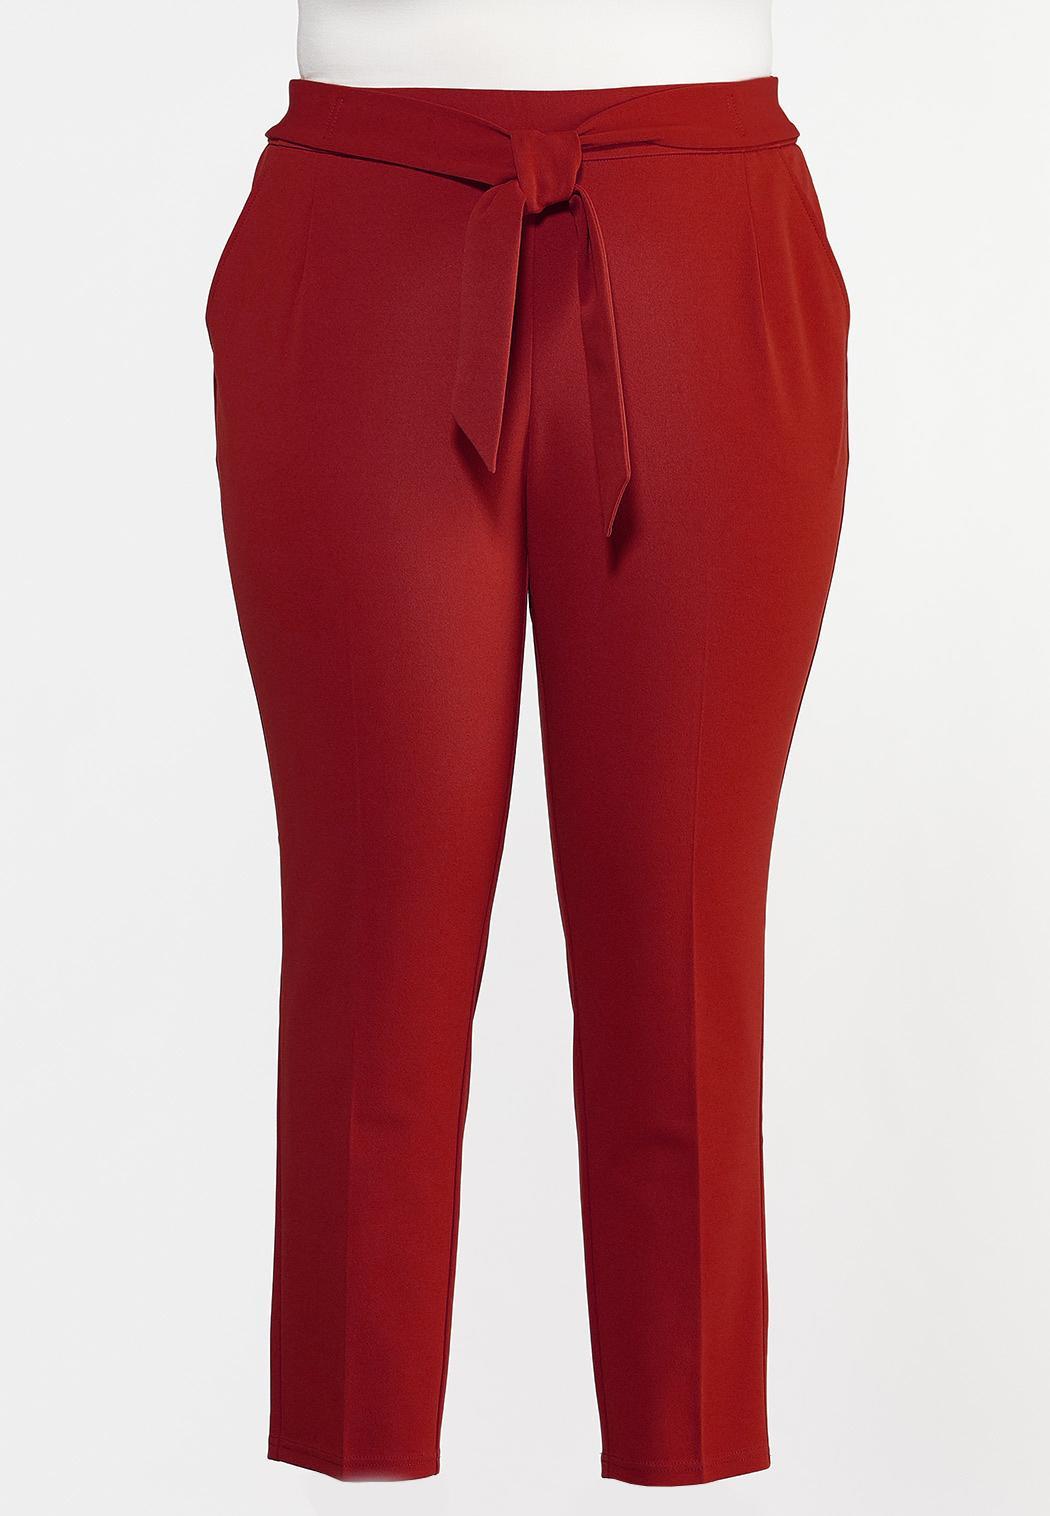 Plus Size Slim Tie Waist Pants